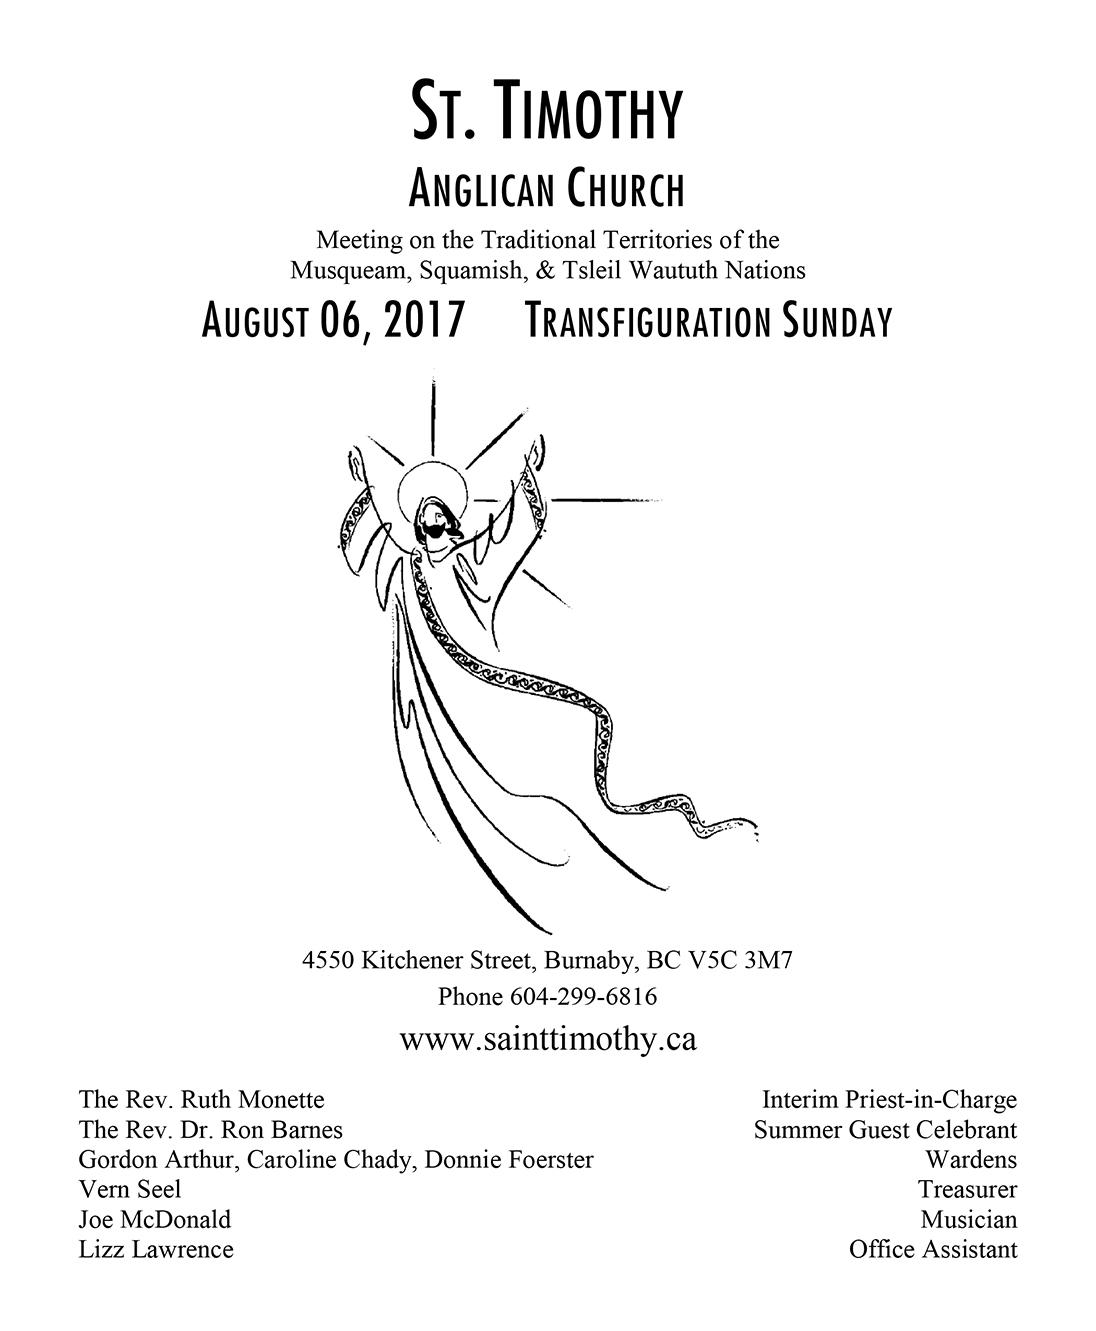 Bulletin: August 6, 2017